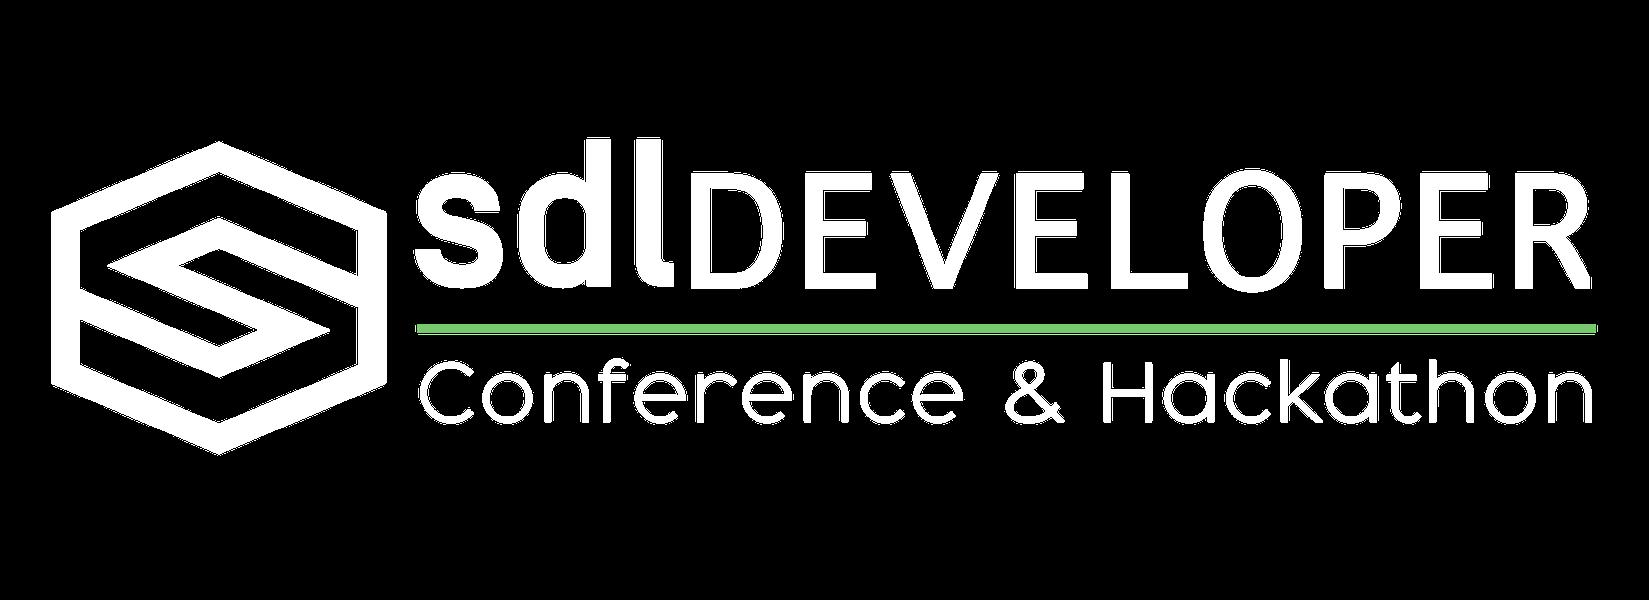 SDL Event Logo 2018_white.png